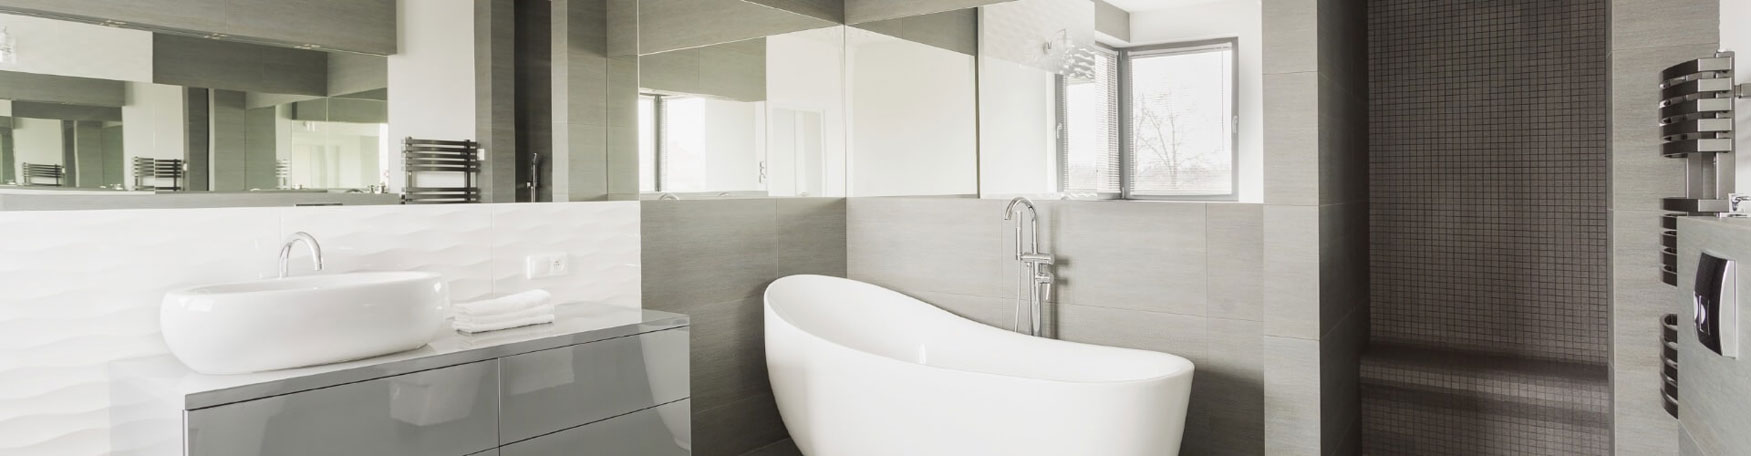 Bellmount Bath